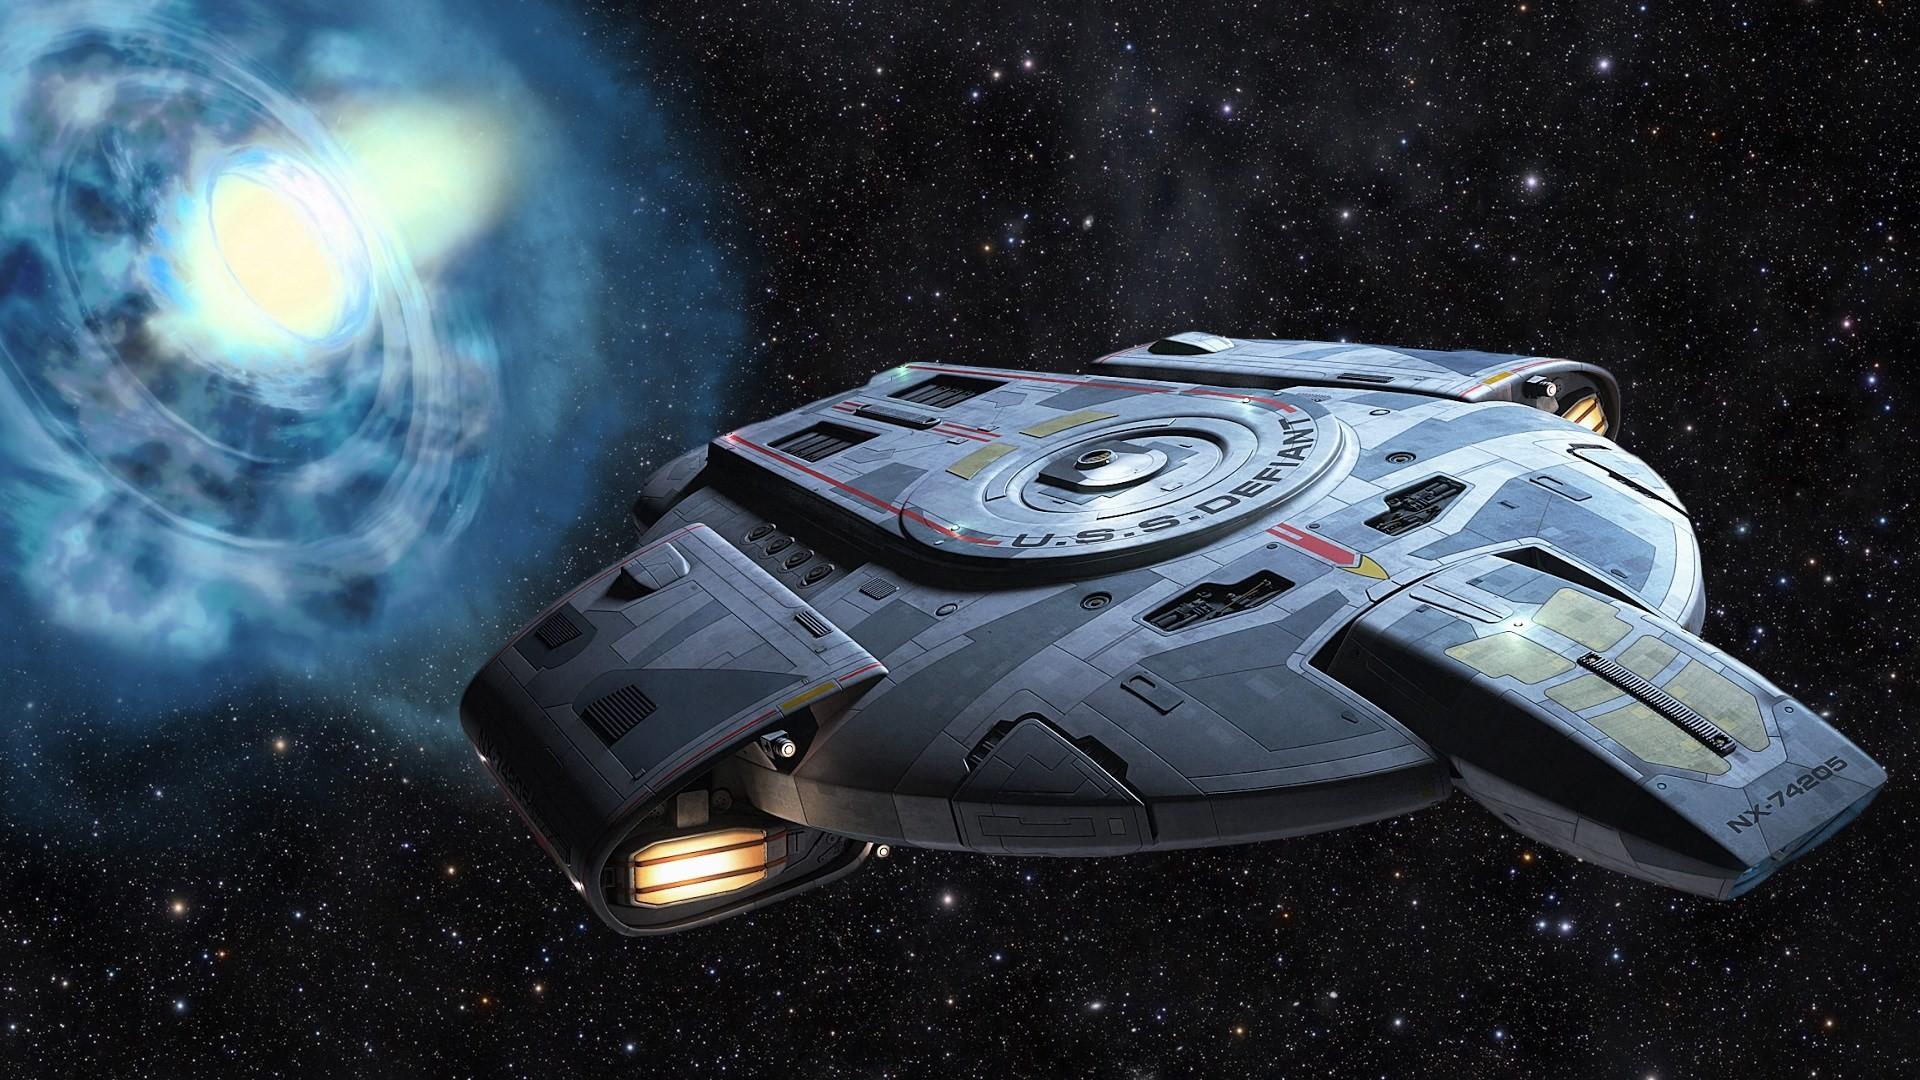 Star Trek Deep Space Nine TV Show HD Wallpapers - All HD